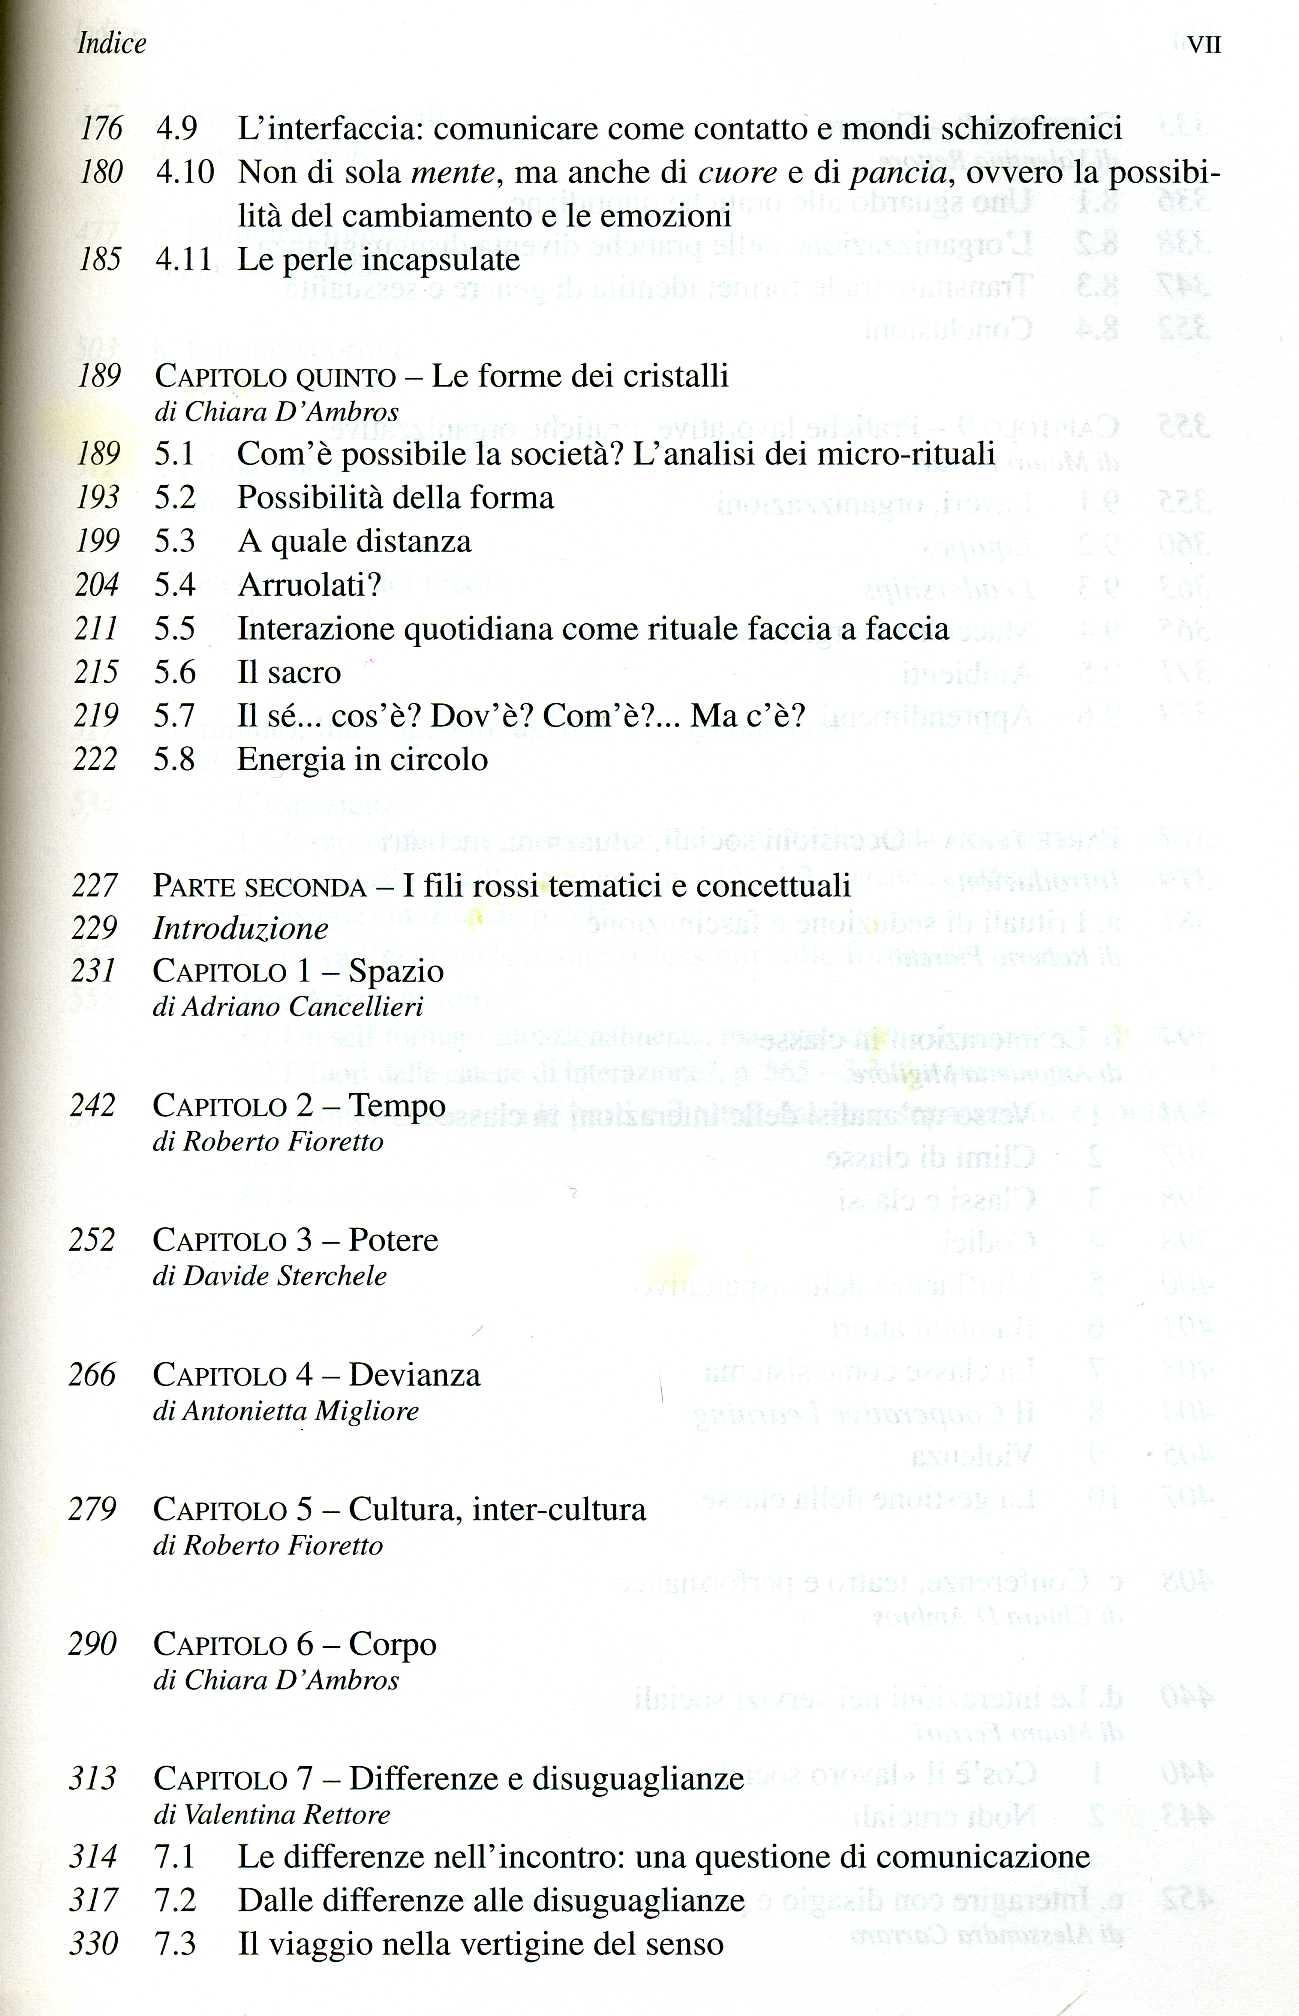 mendola2579